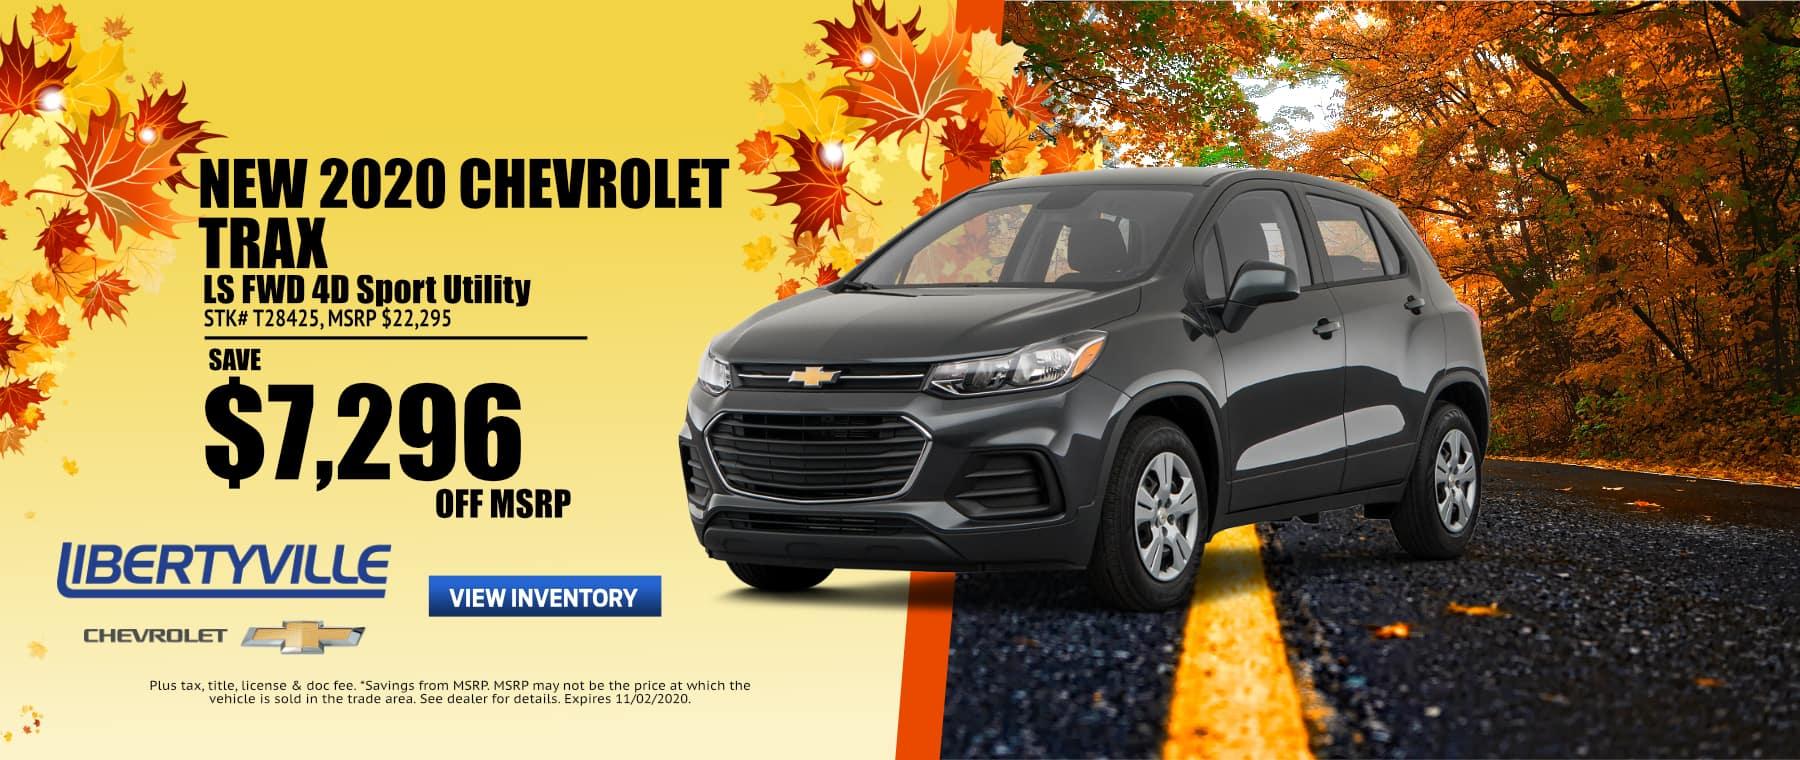 October-2020 Trax Libertyville